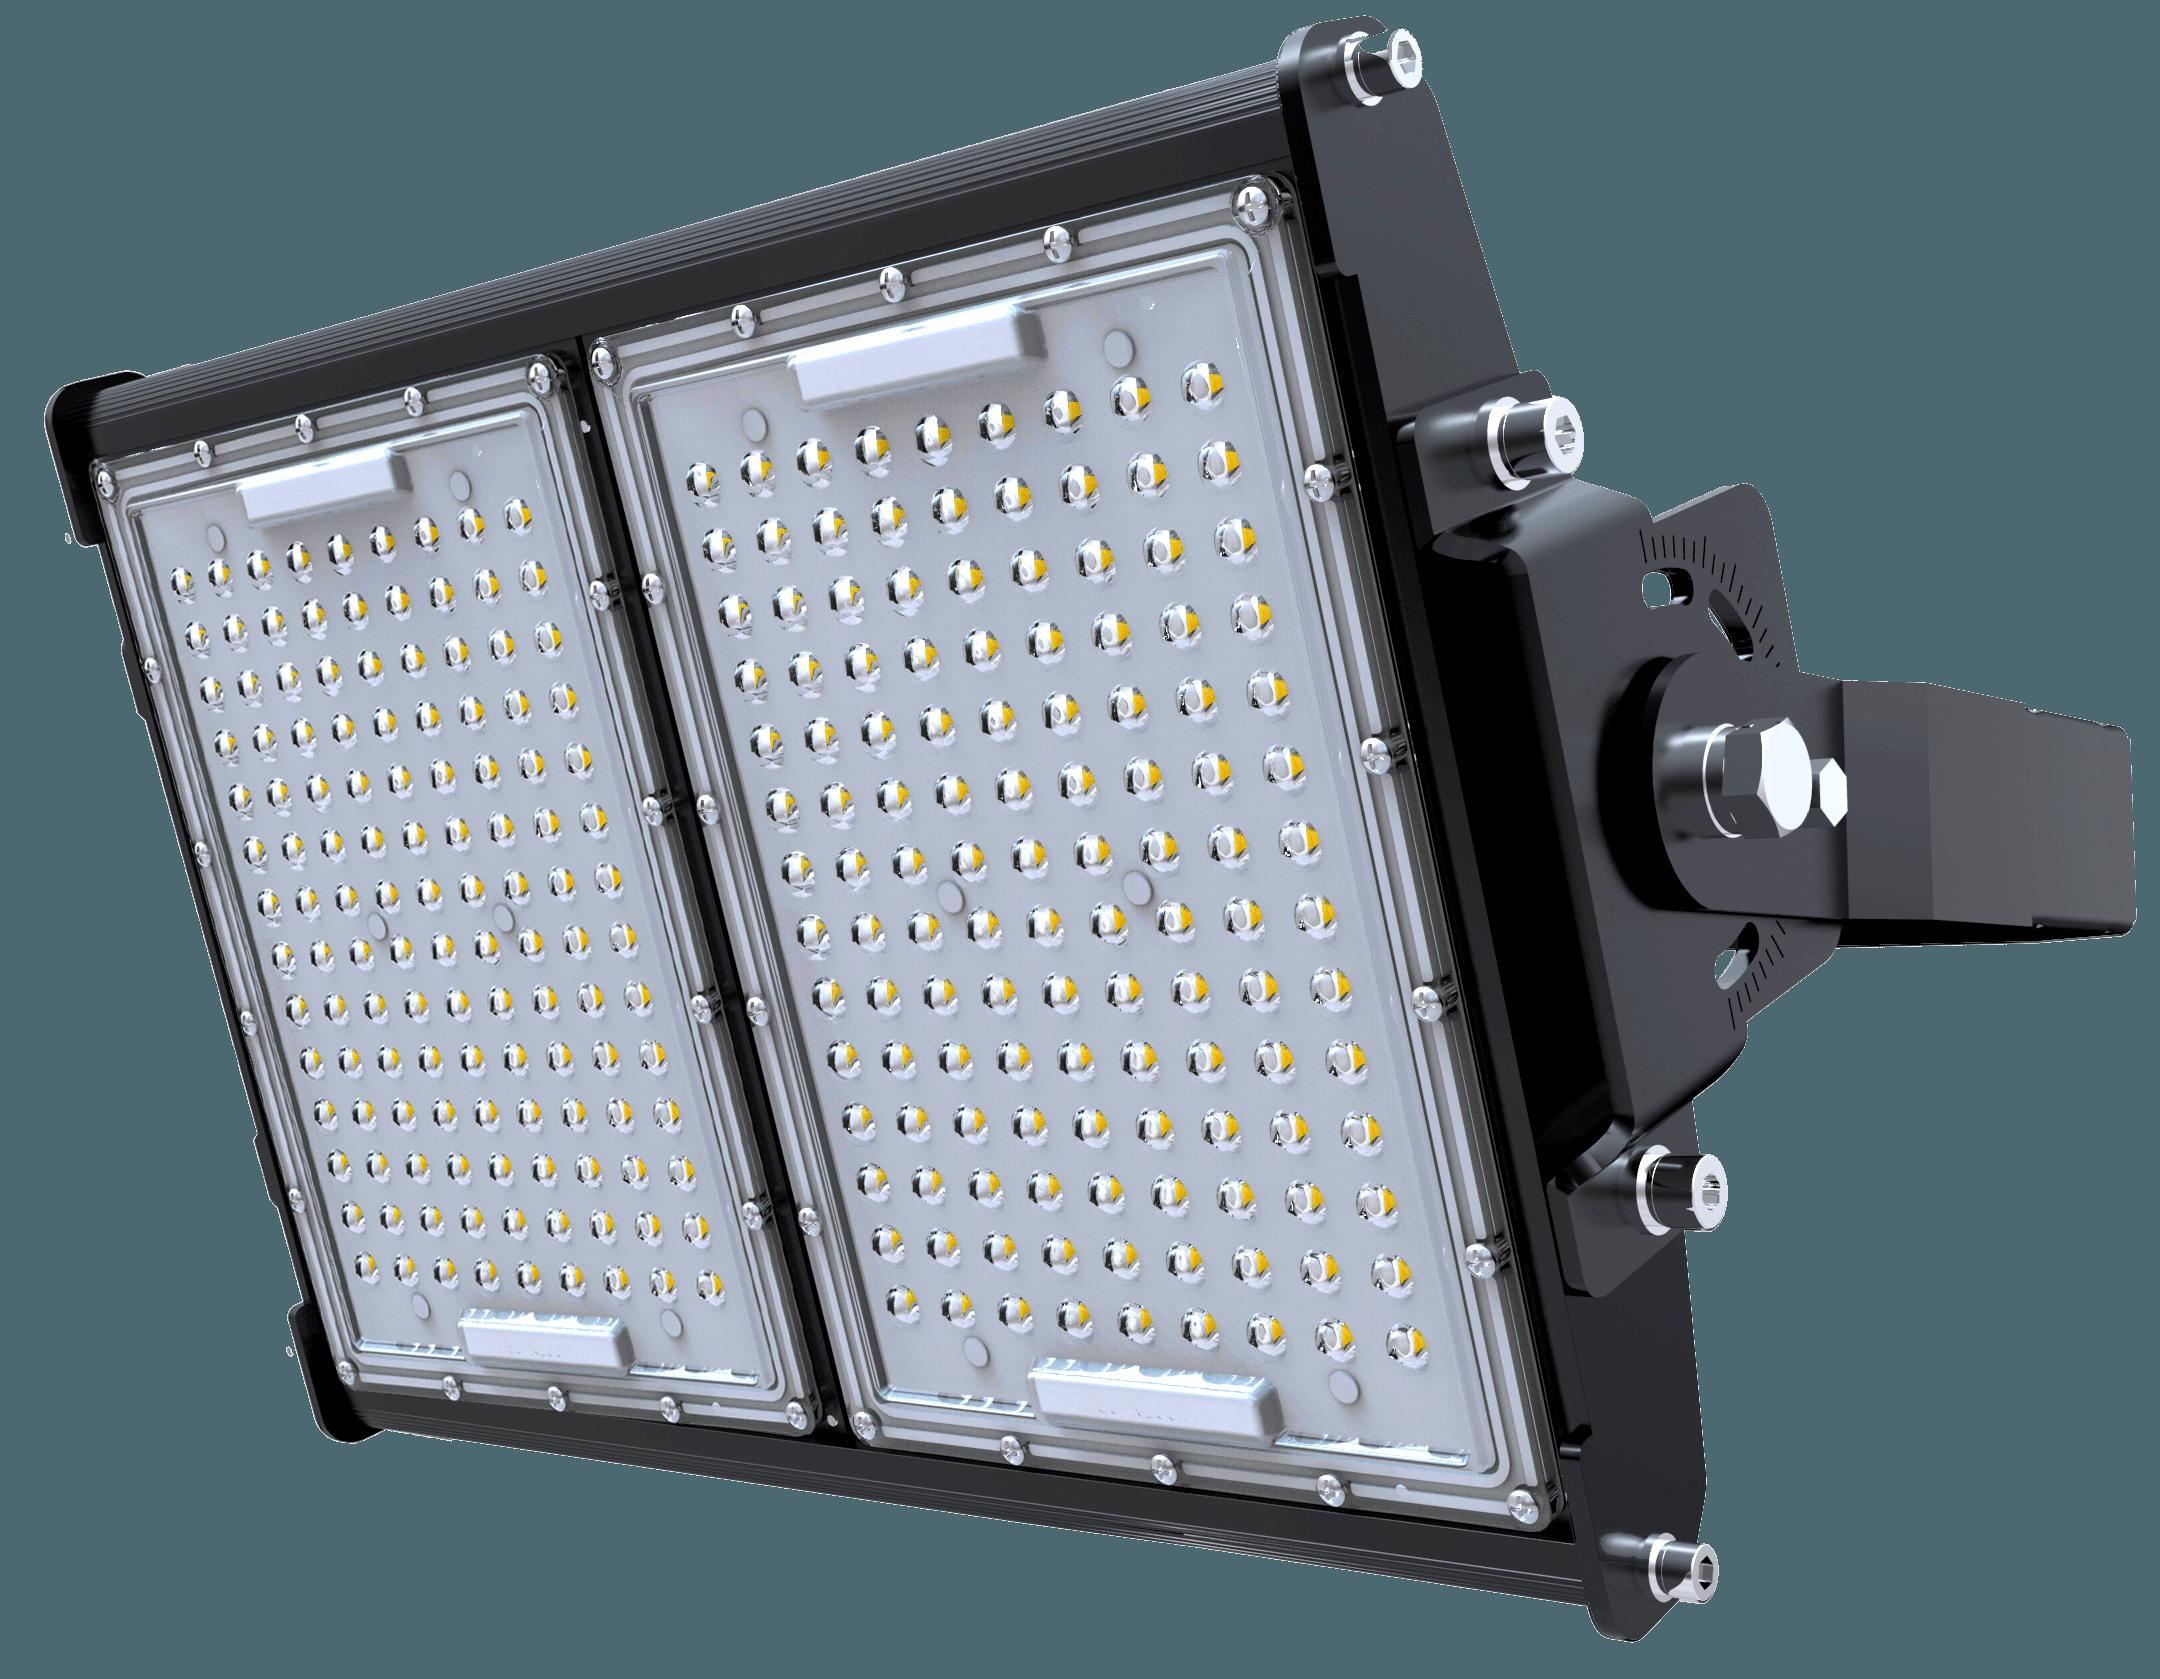 LED Stadium Light 240W, Super Bright Outdoor Flood Light , IP65 Waterproof